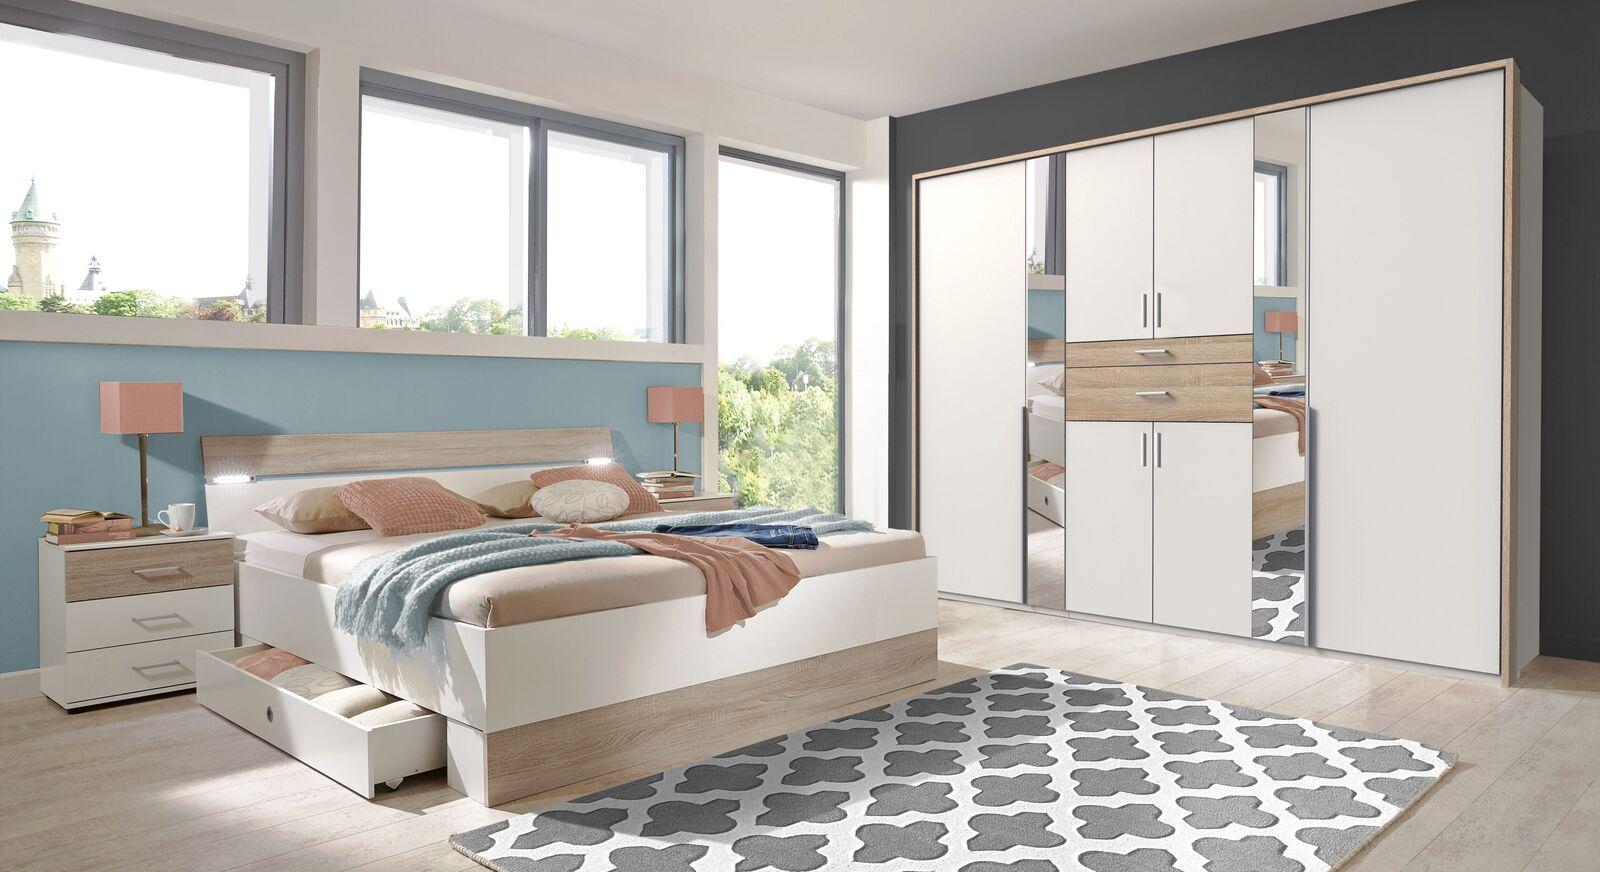 Komplett-Schlafzimmer Kormoran in moderner Optik